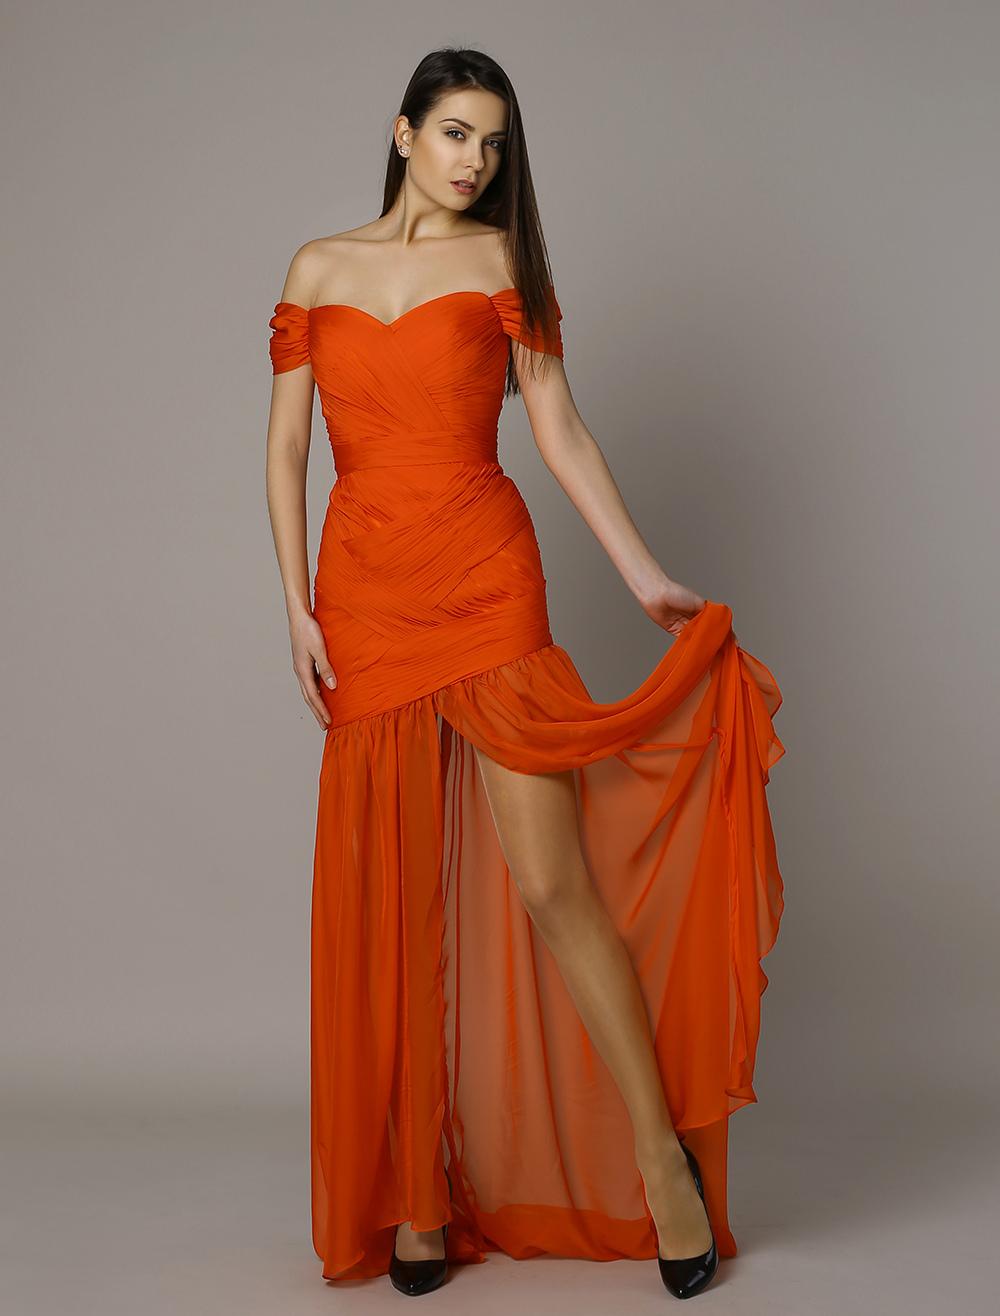 Alex Jones Bafta Red Off The Shoulder Ruched Split Chiffon Mermaid Dress - Milanoocom-1542